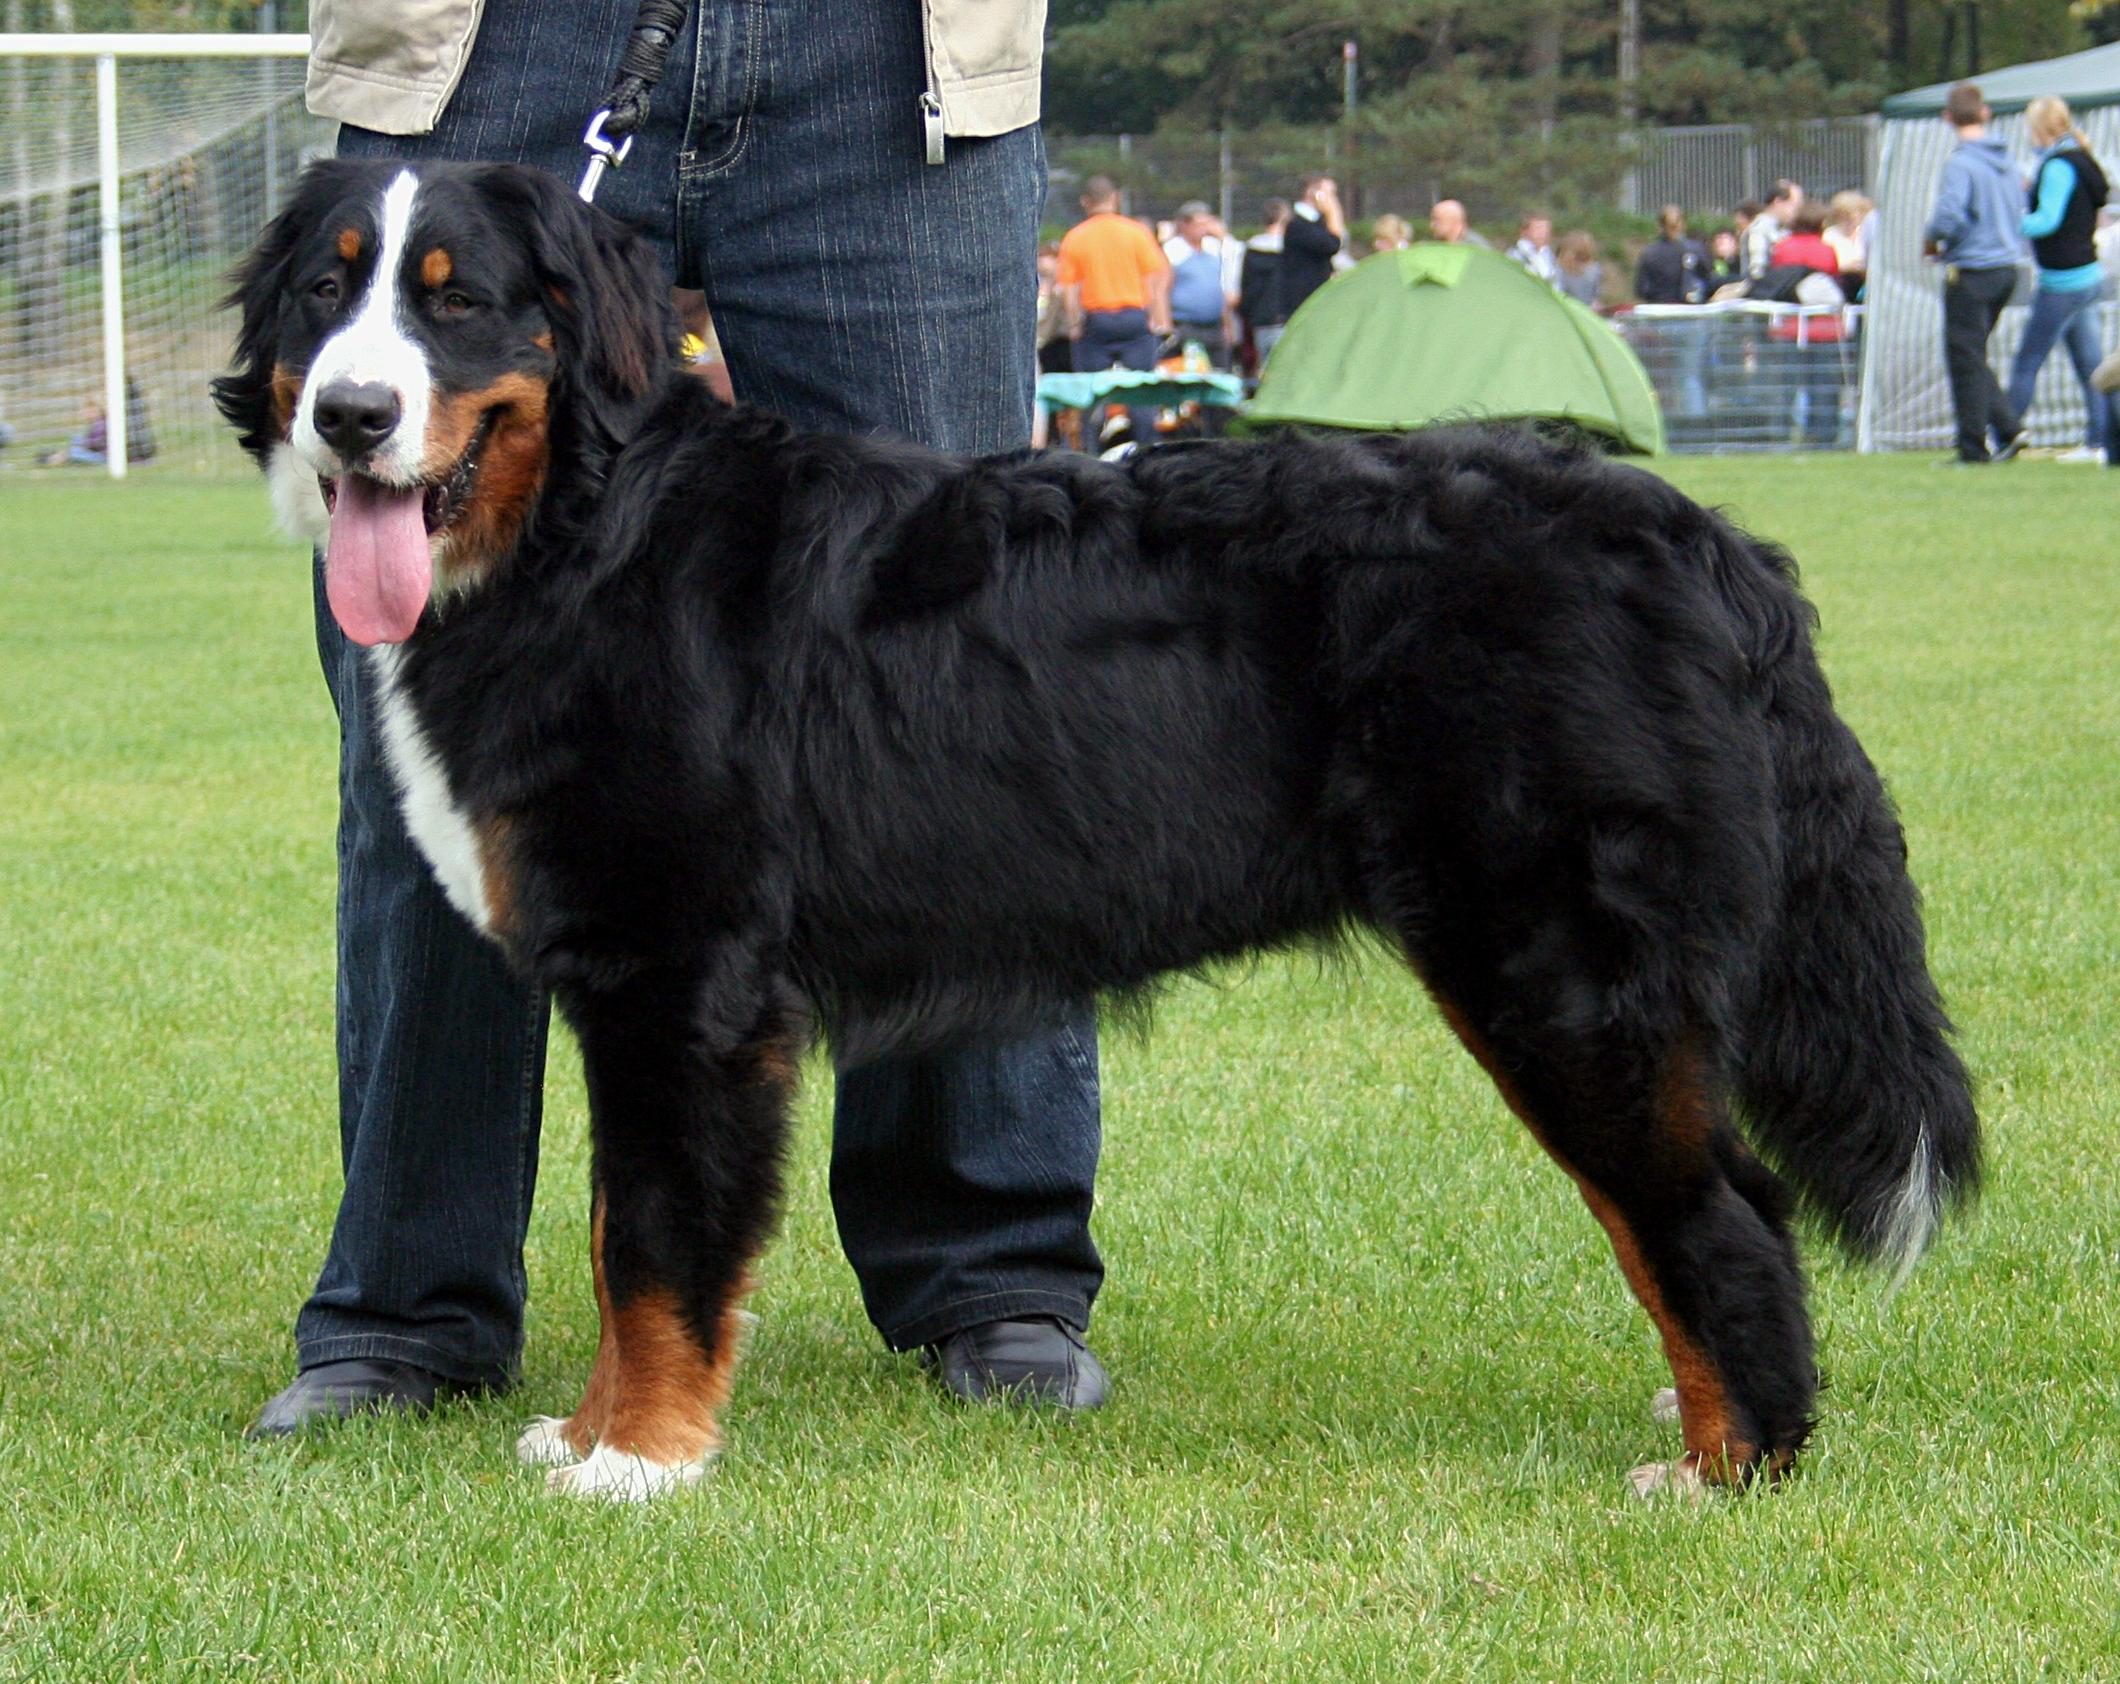 Tidsmæssigt Berner Sennenhund - Wikipedia, den frie encyklopædi UZ-81